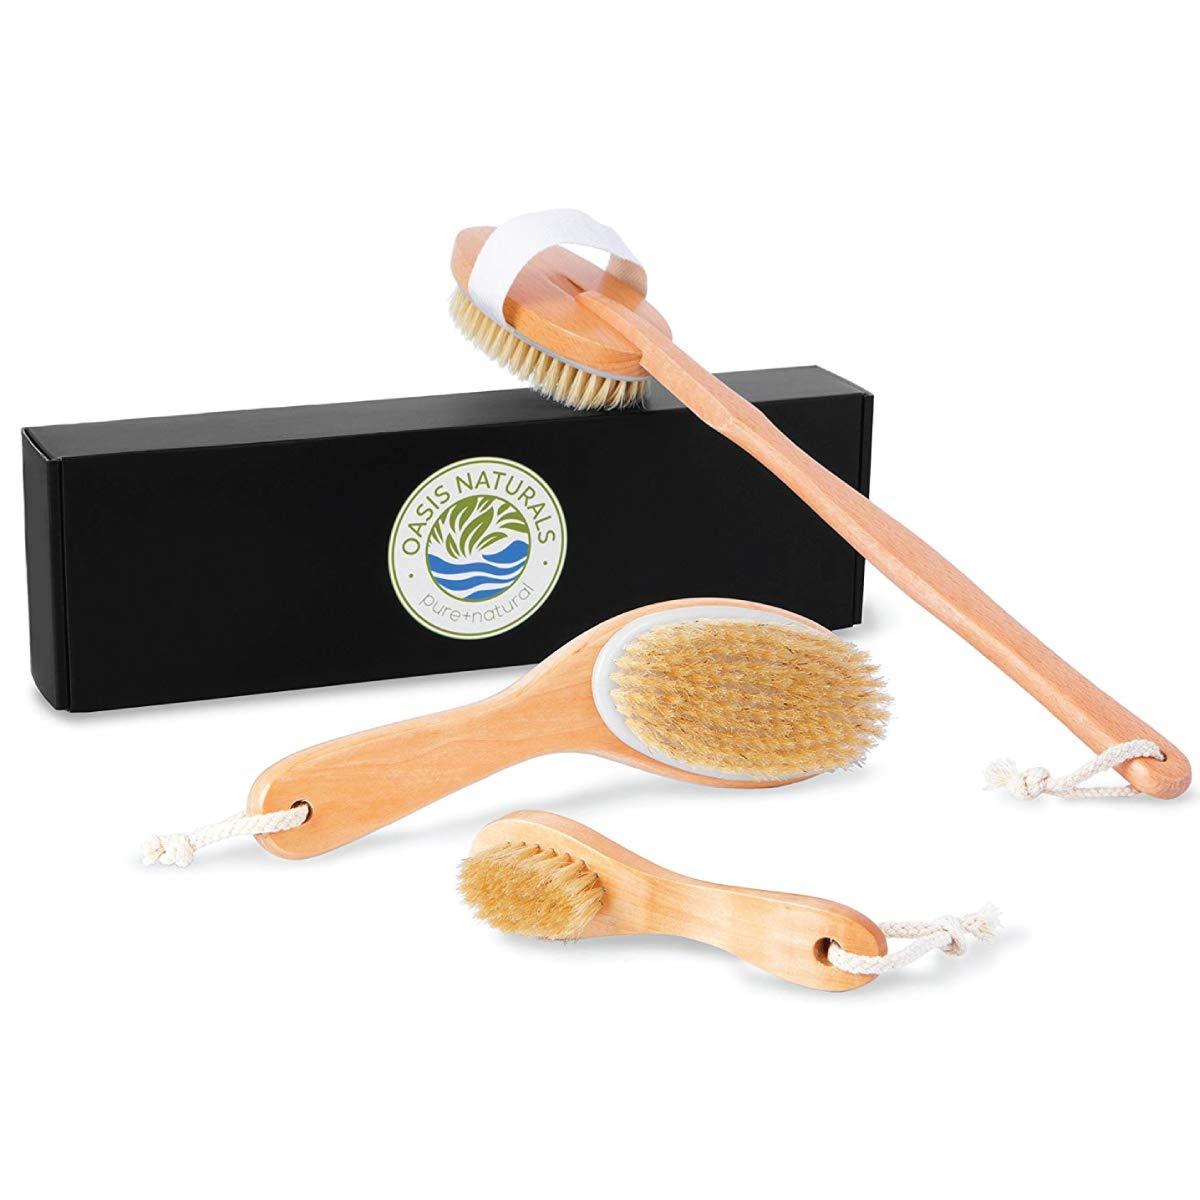 Exfoliating Max 54% OFF Regular store Dry Or Wet Body Wash Brushing Imp Brush Set for